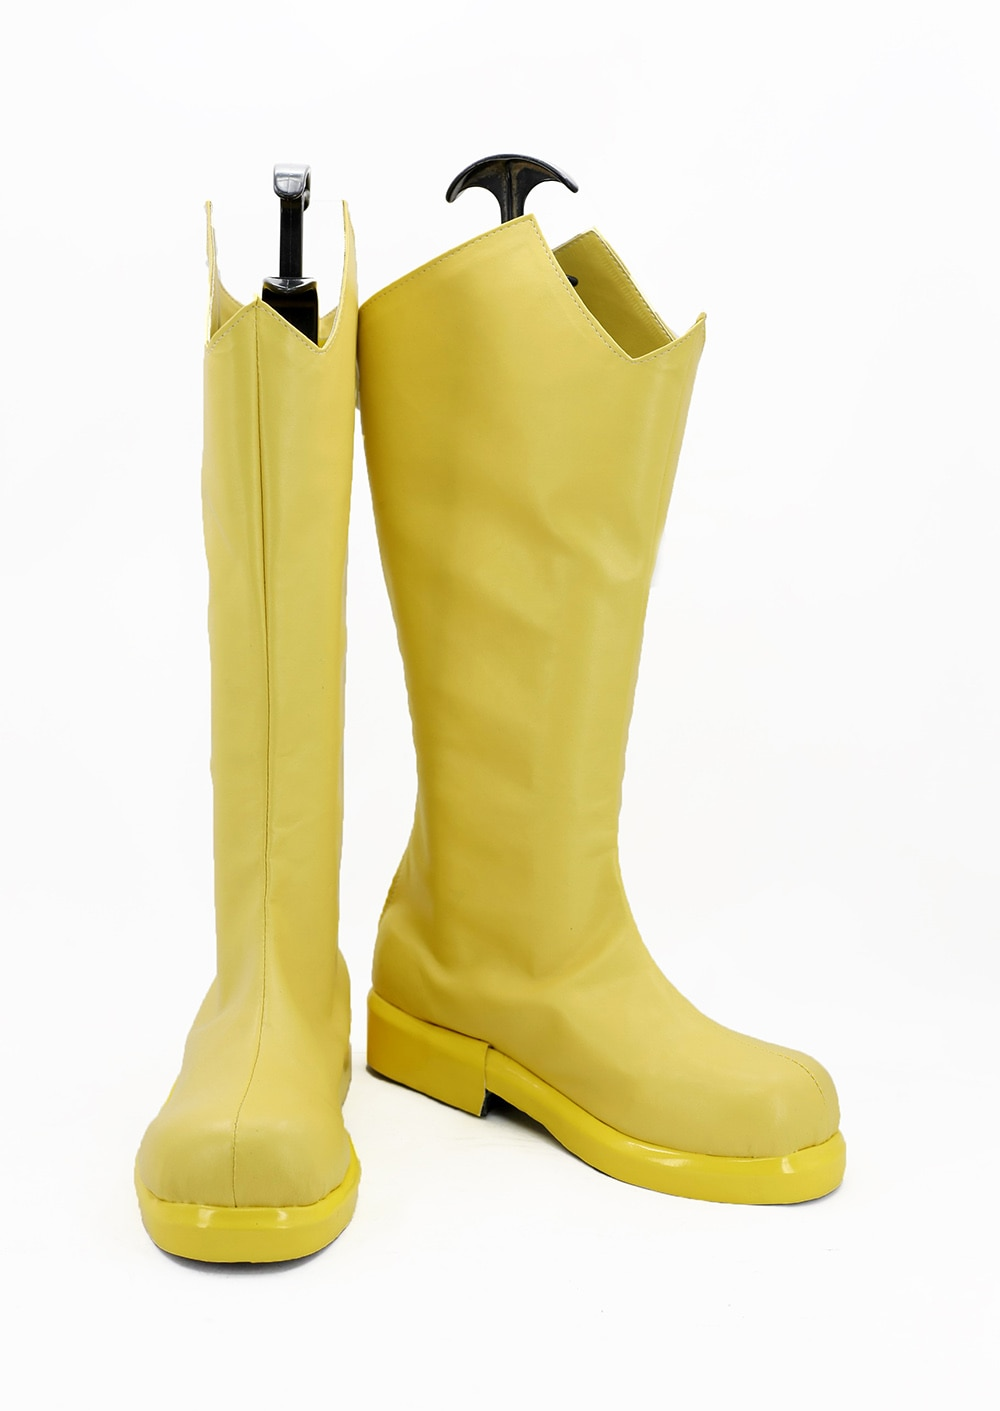 Os Vingadores Vespa Janet van Dyne Cosplay Botas Sapatos Amarelo Feito Sob Encomenda